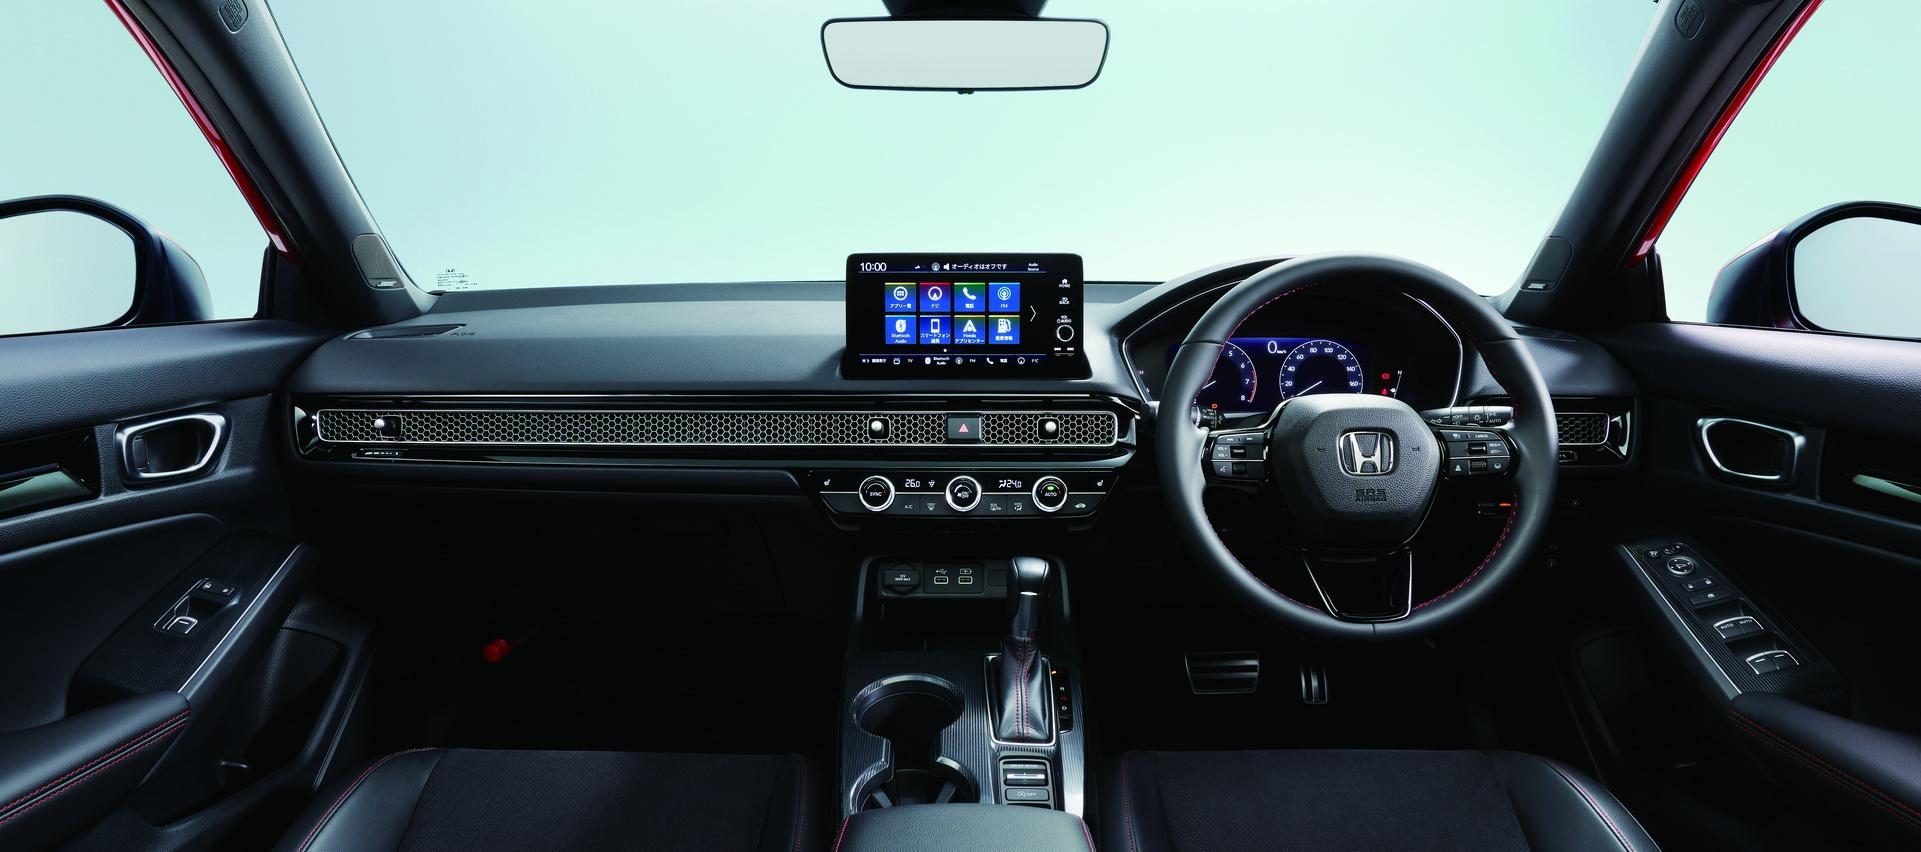 Honda-Civic-hatchback-21